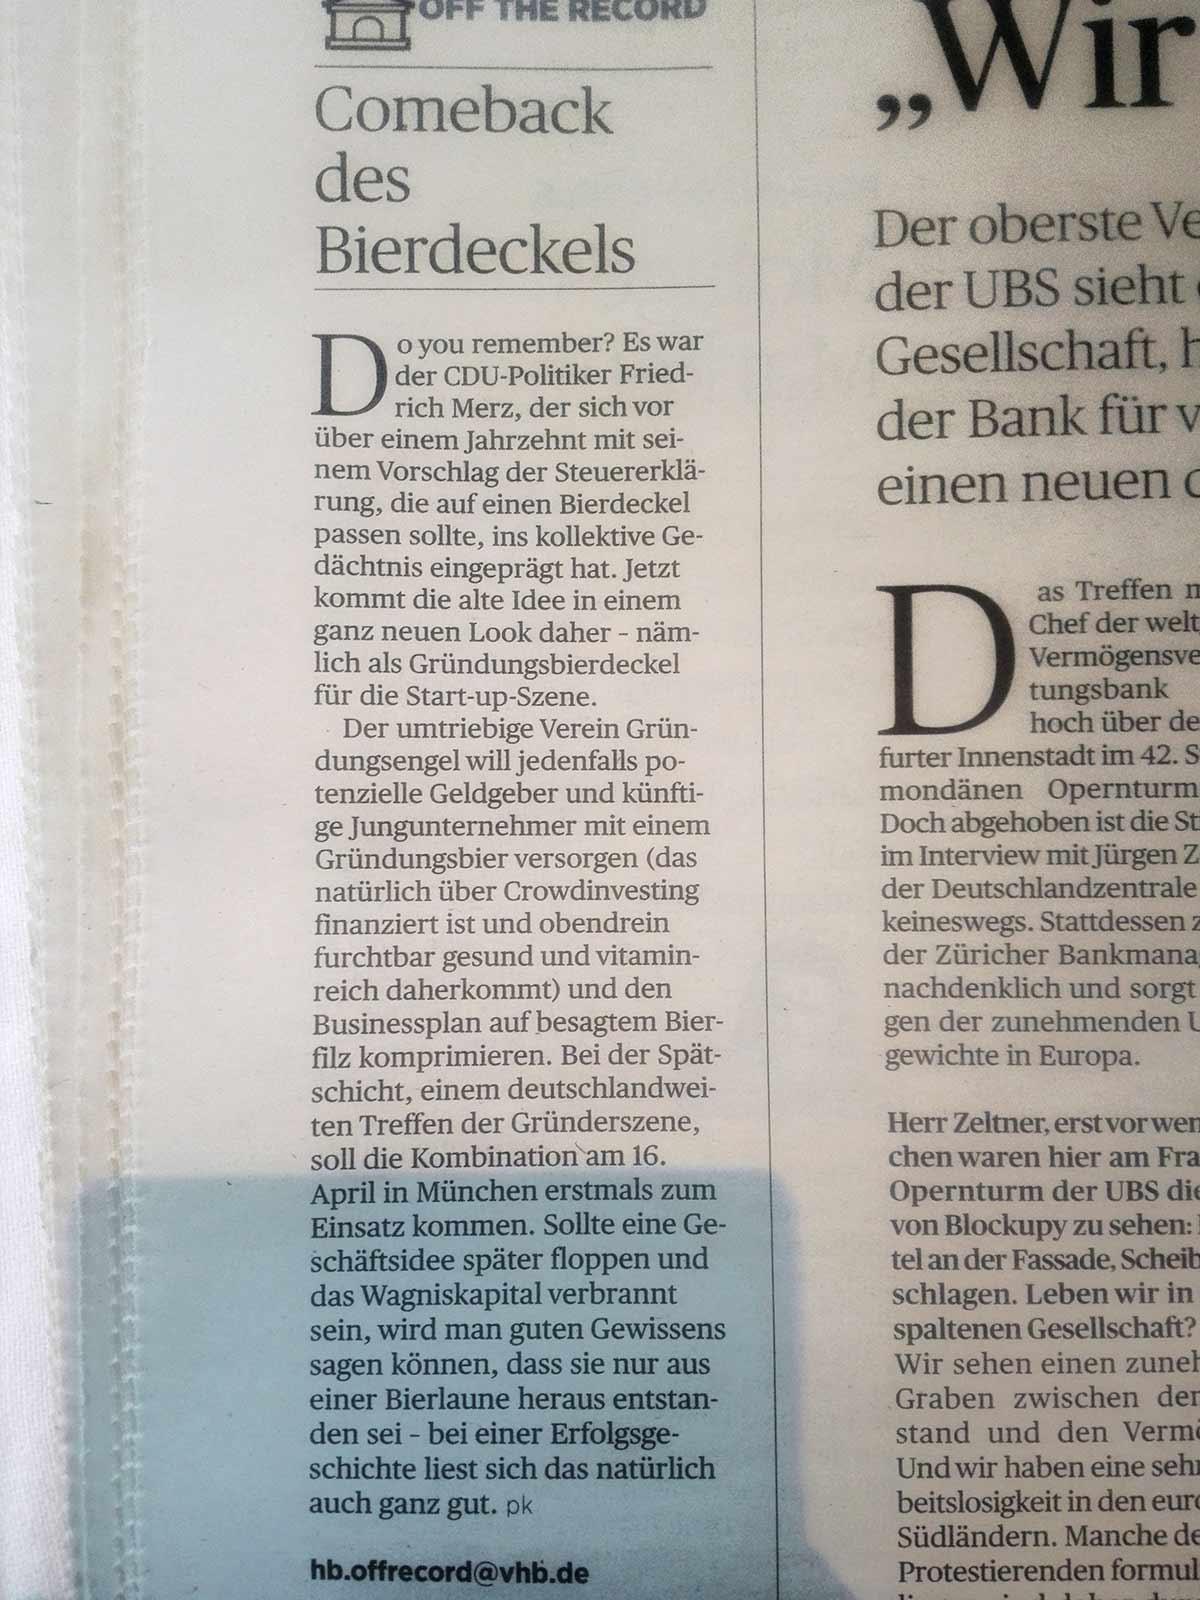 Handelsblatt: Gründungsengel e.V. entwickelt Bierdeckel-Businessplan